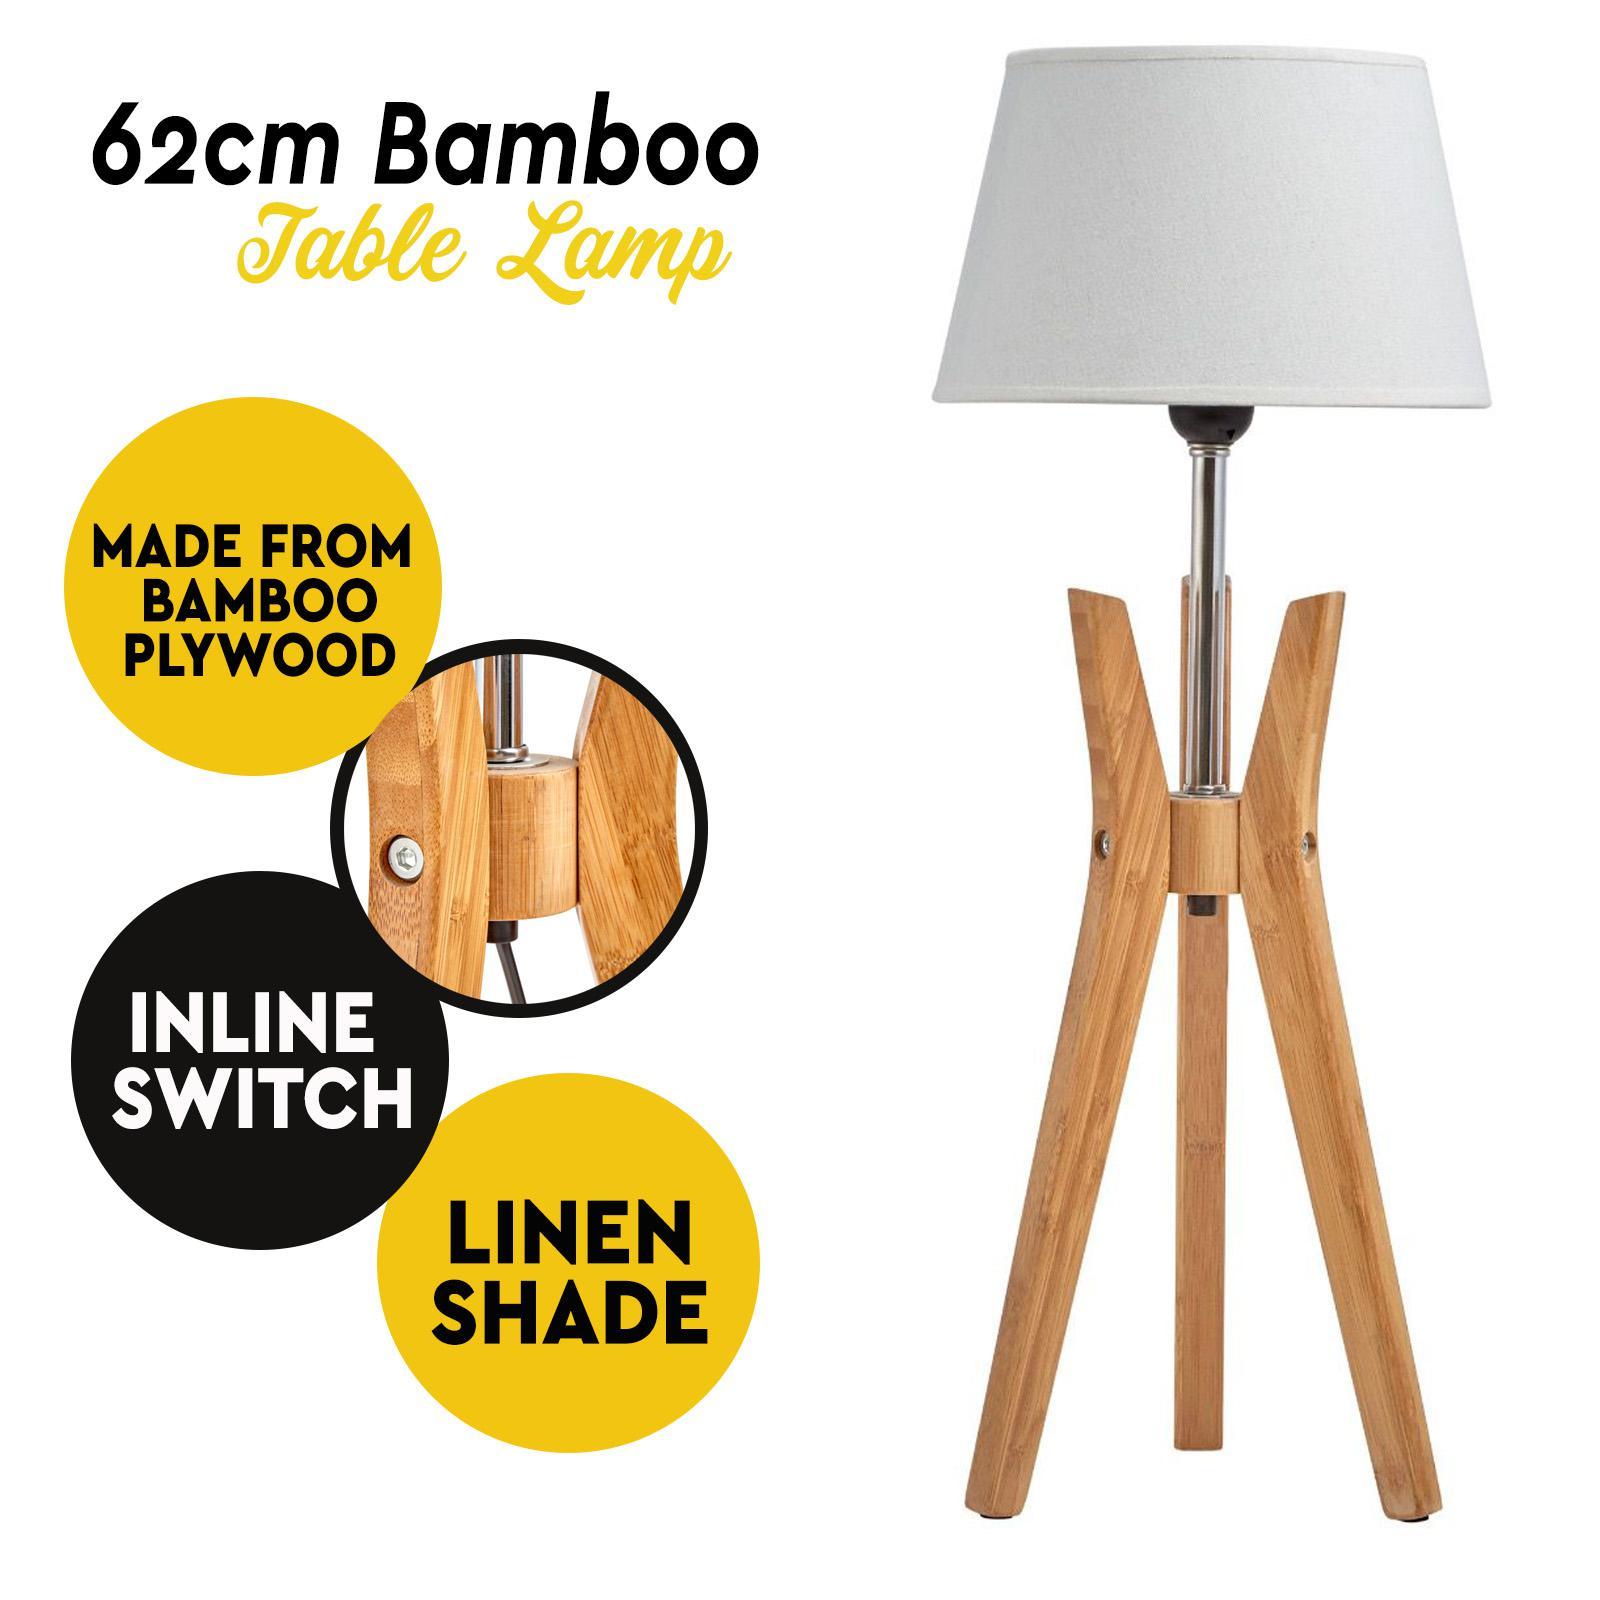 Designer Bamboo Table Lamp Tripod Base Linen Shade Modern Rustic Geo Light Matt Blatt